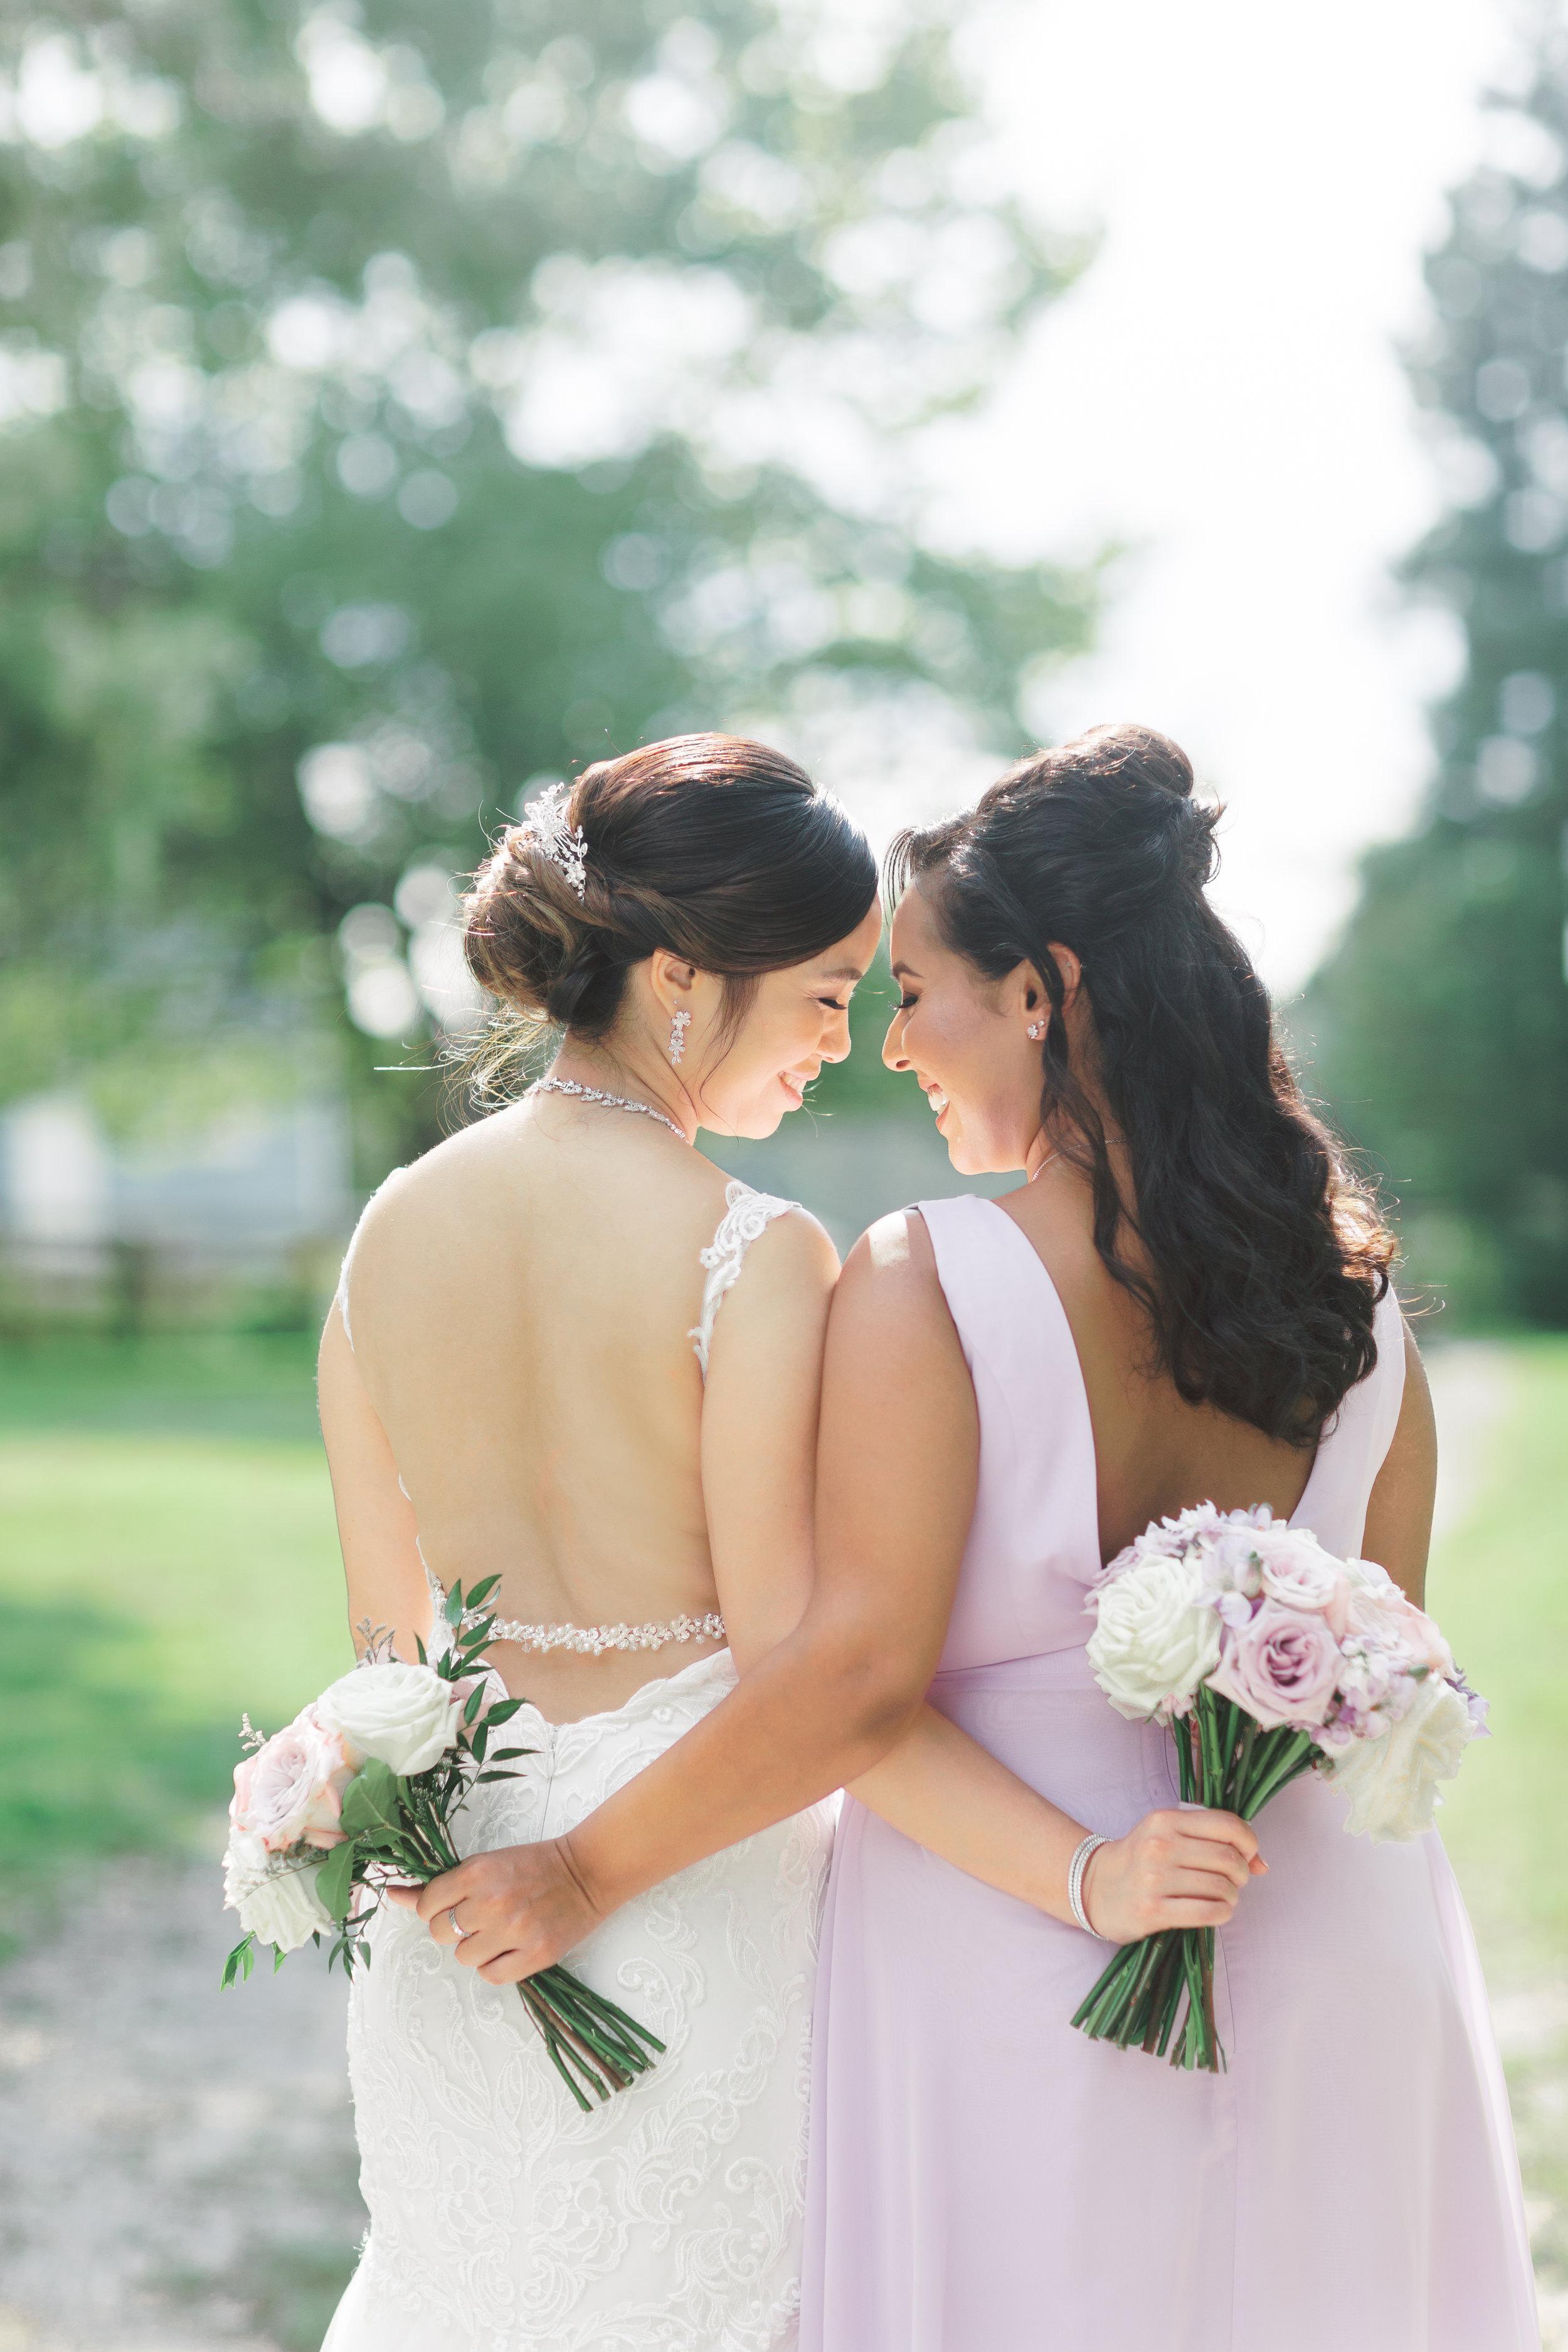 Angus Glen Wedding - Bridal Portraits-85.jpg